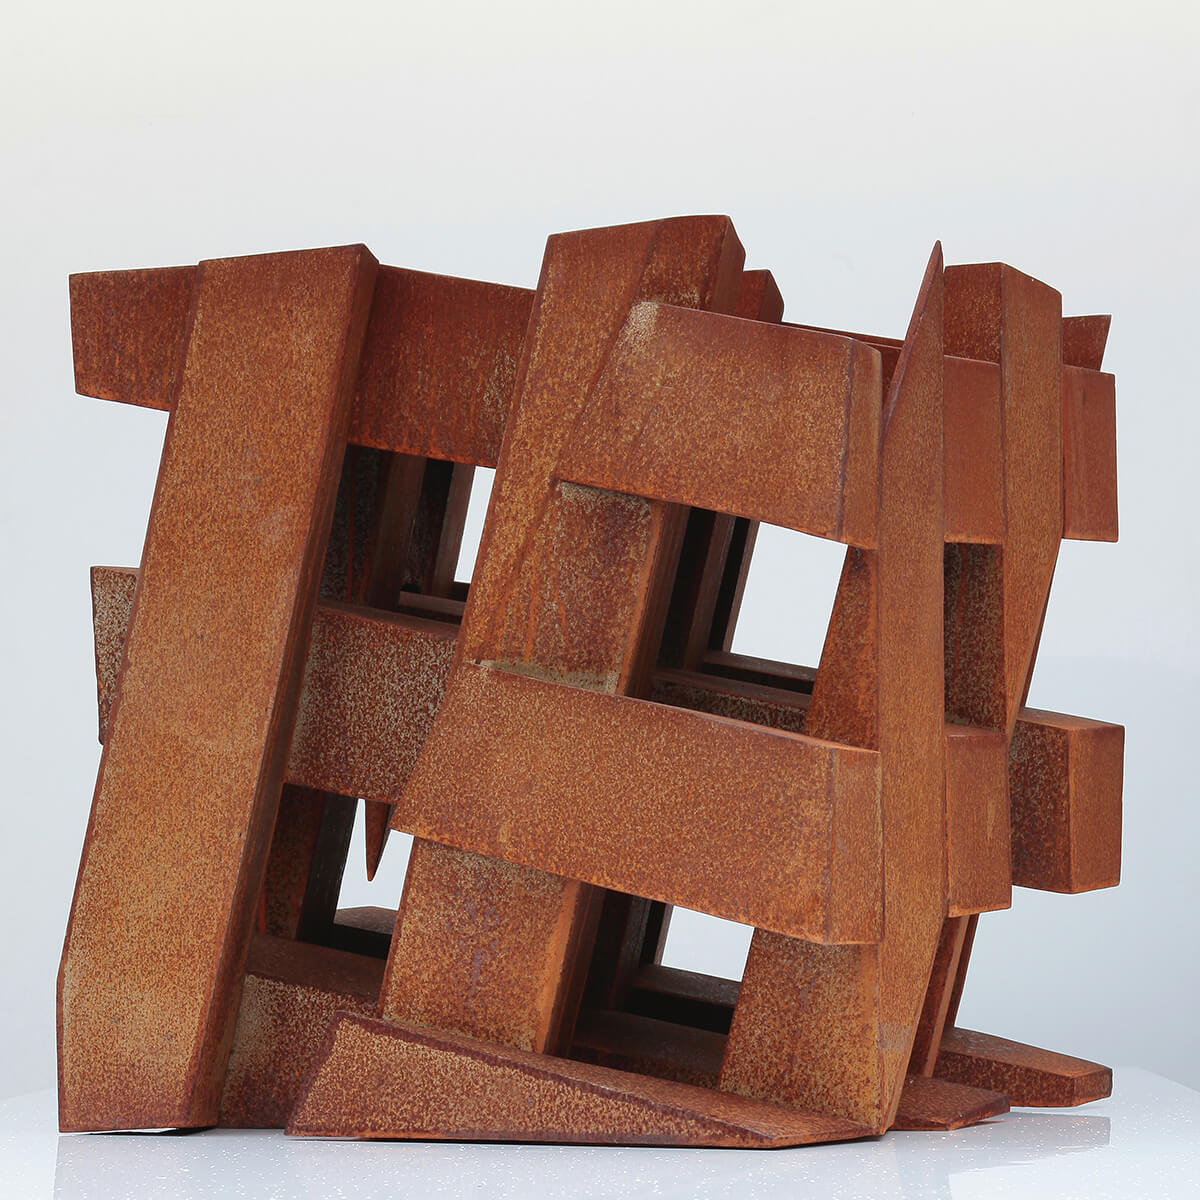 Bildhauer OMI Riesterer Skulpturen Würfel Stahl geschweisst